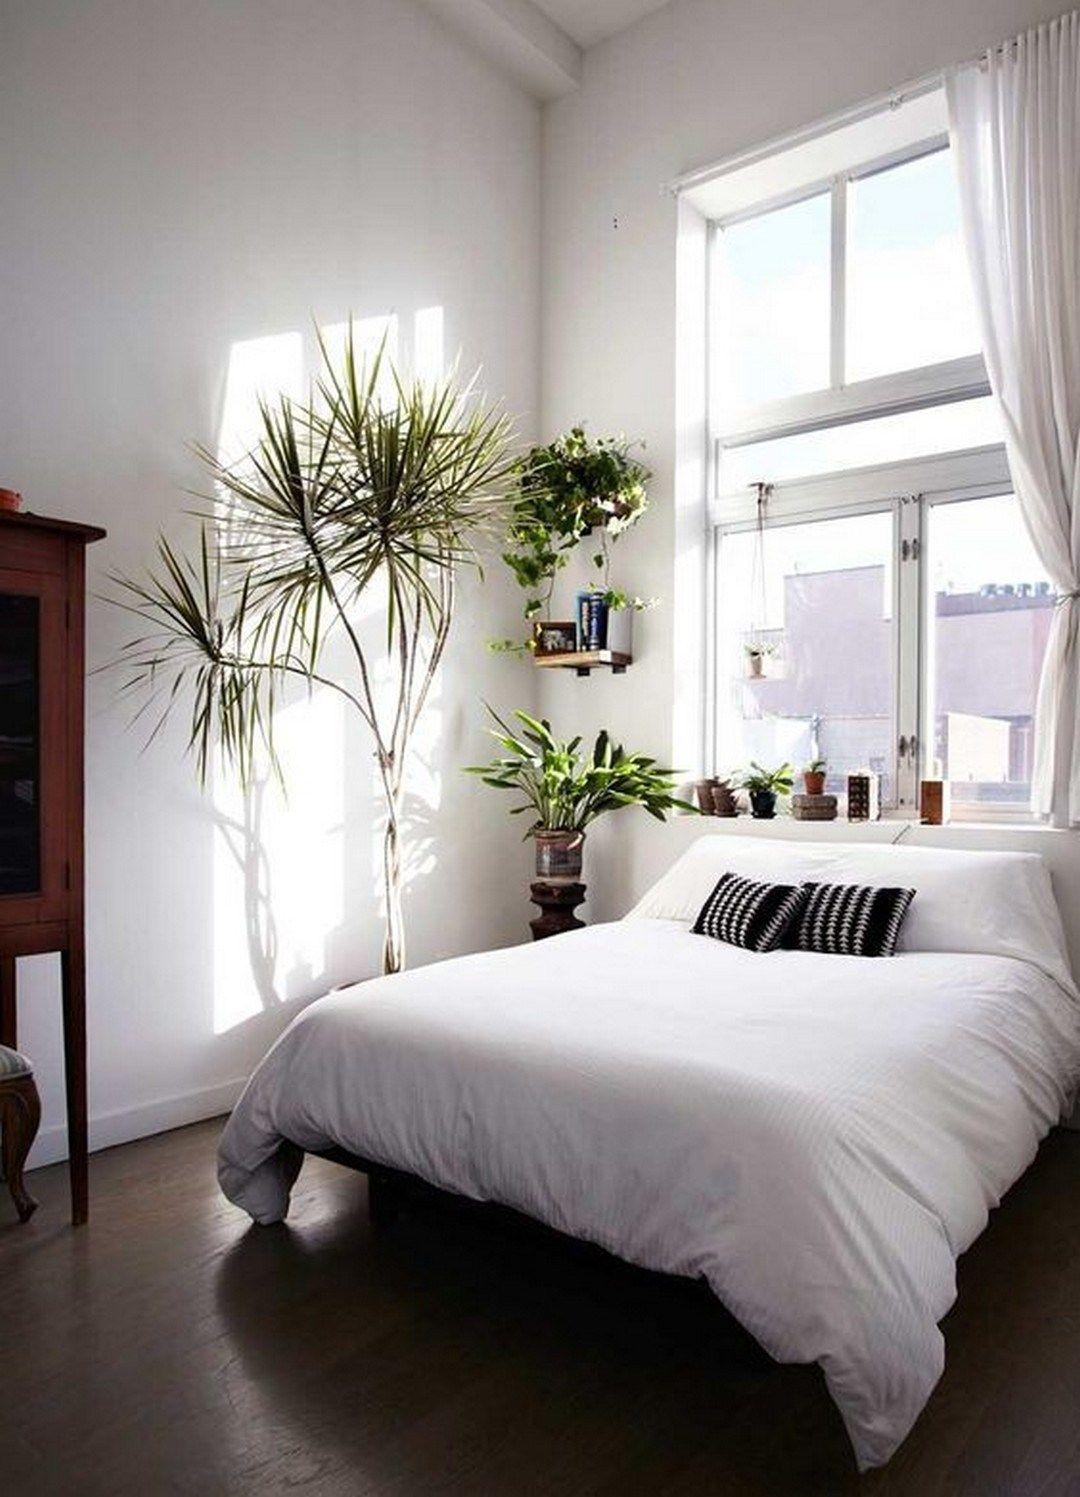 Elegant bedroom interior design  elegant cozy bedroom ideas with small spaces   guest room